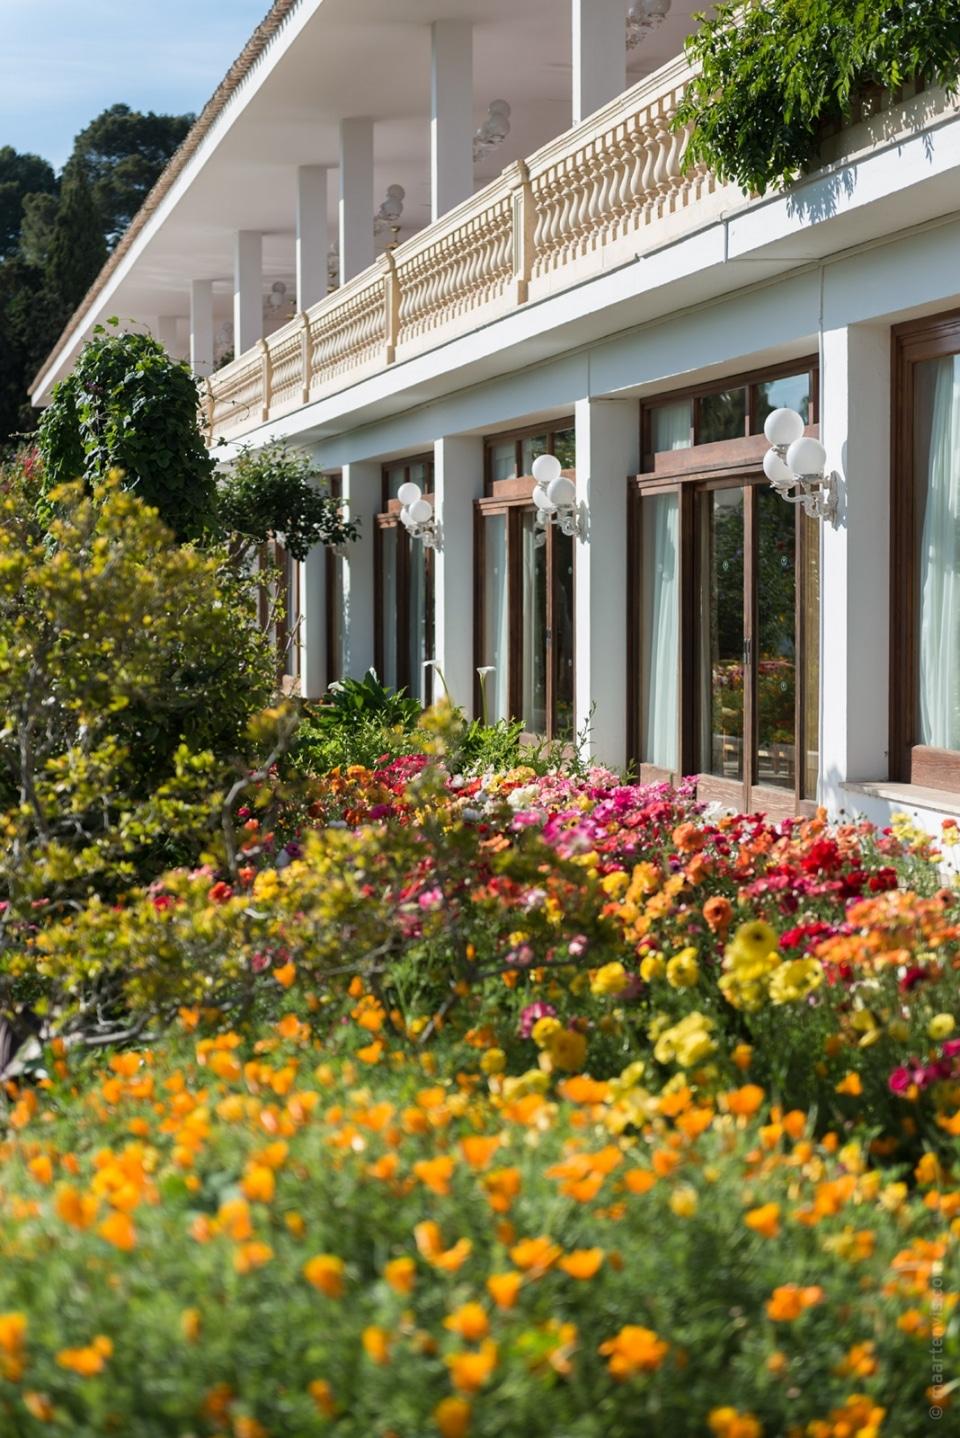 20140429 9560 960x1438 - Hotel Formentor in Spring